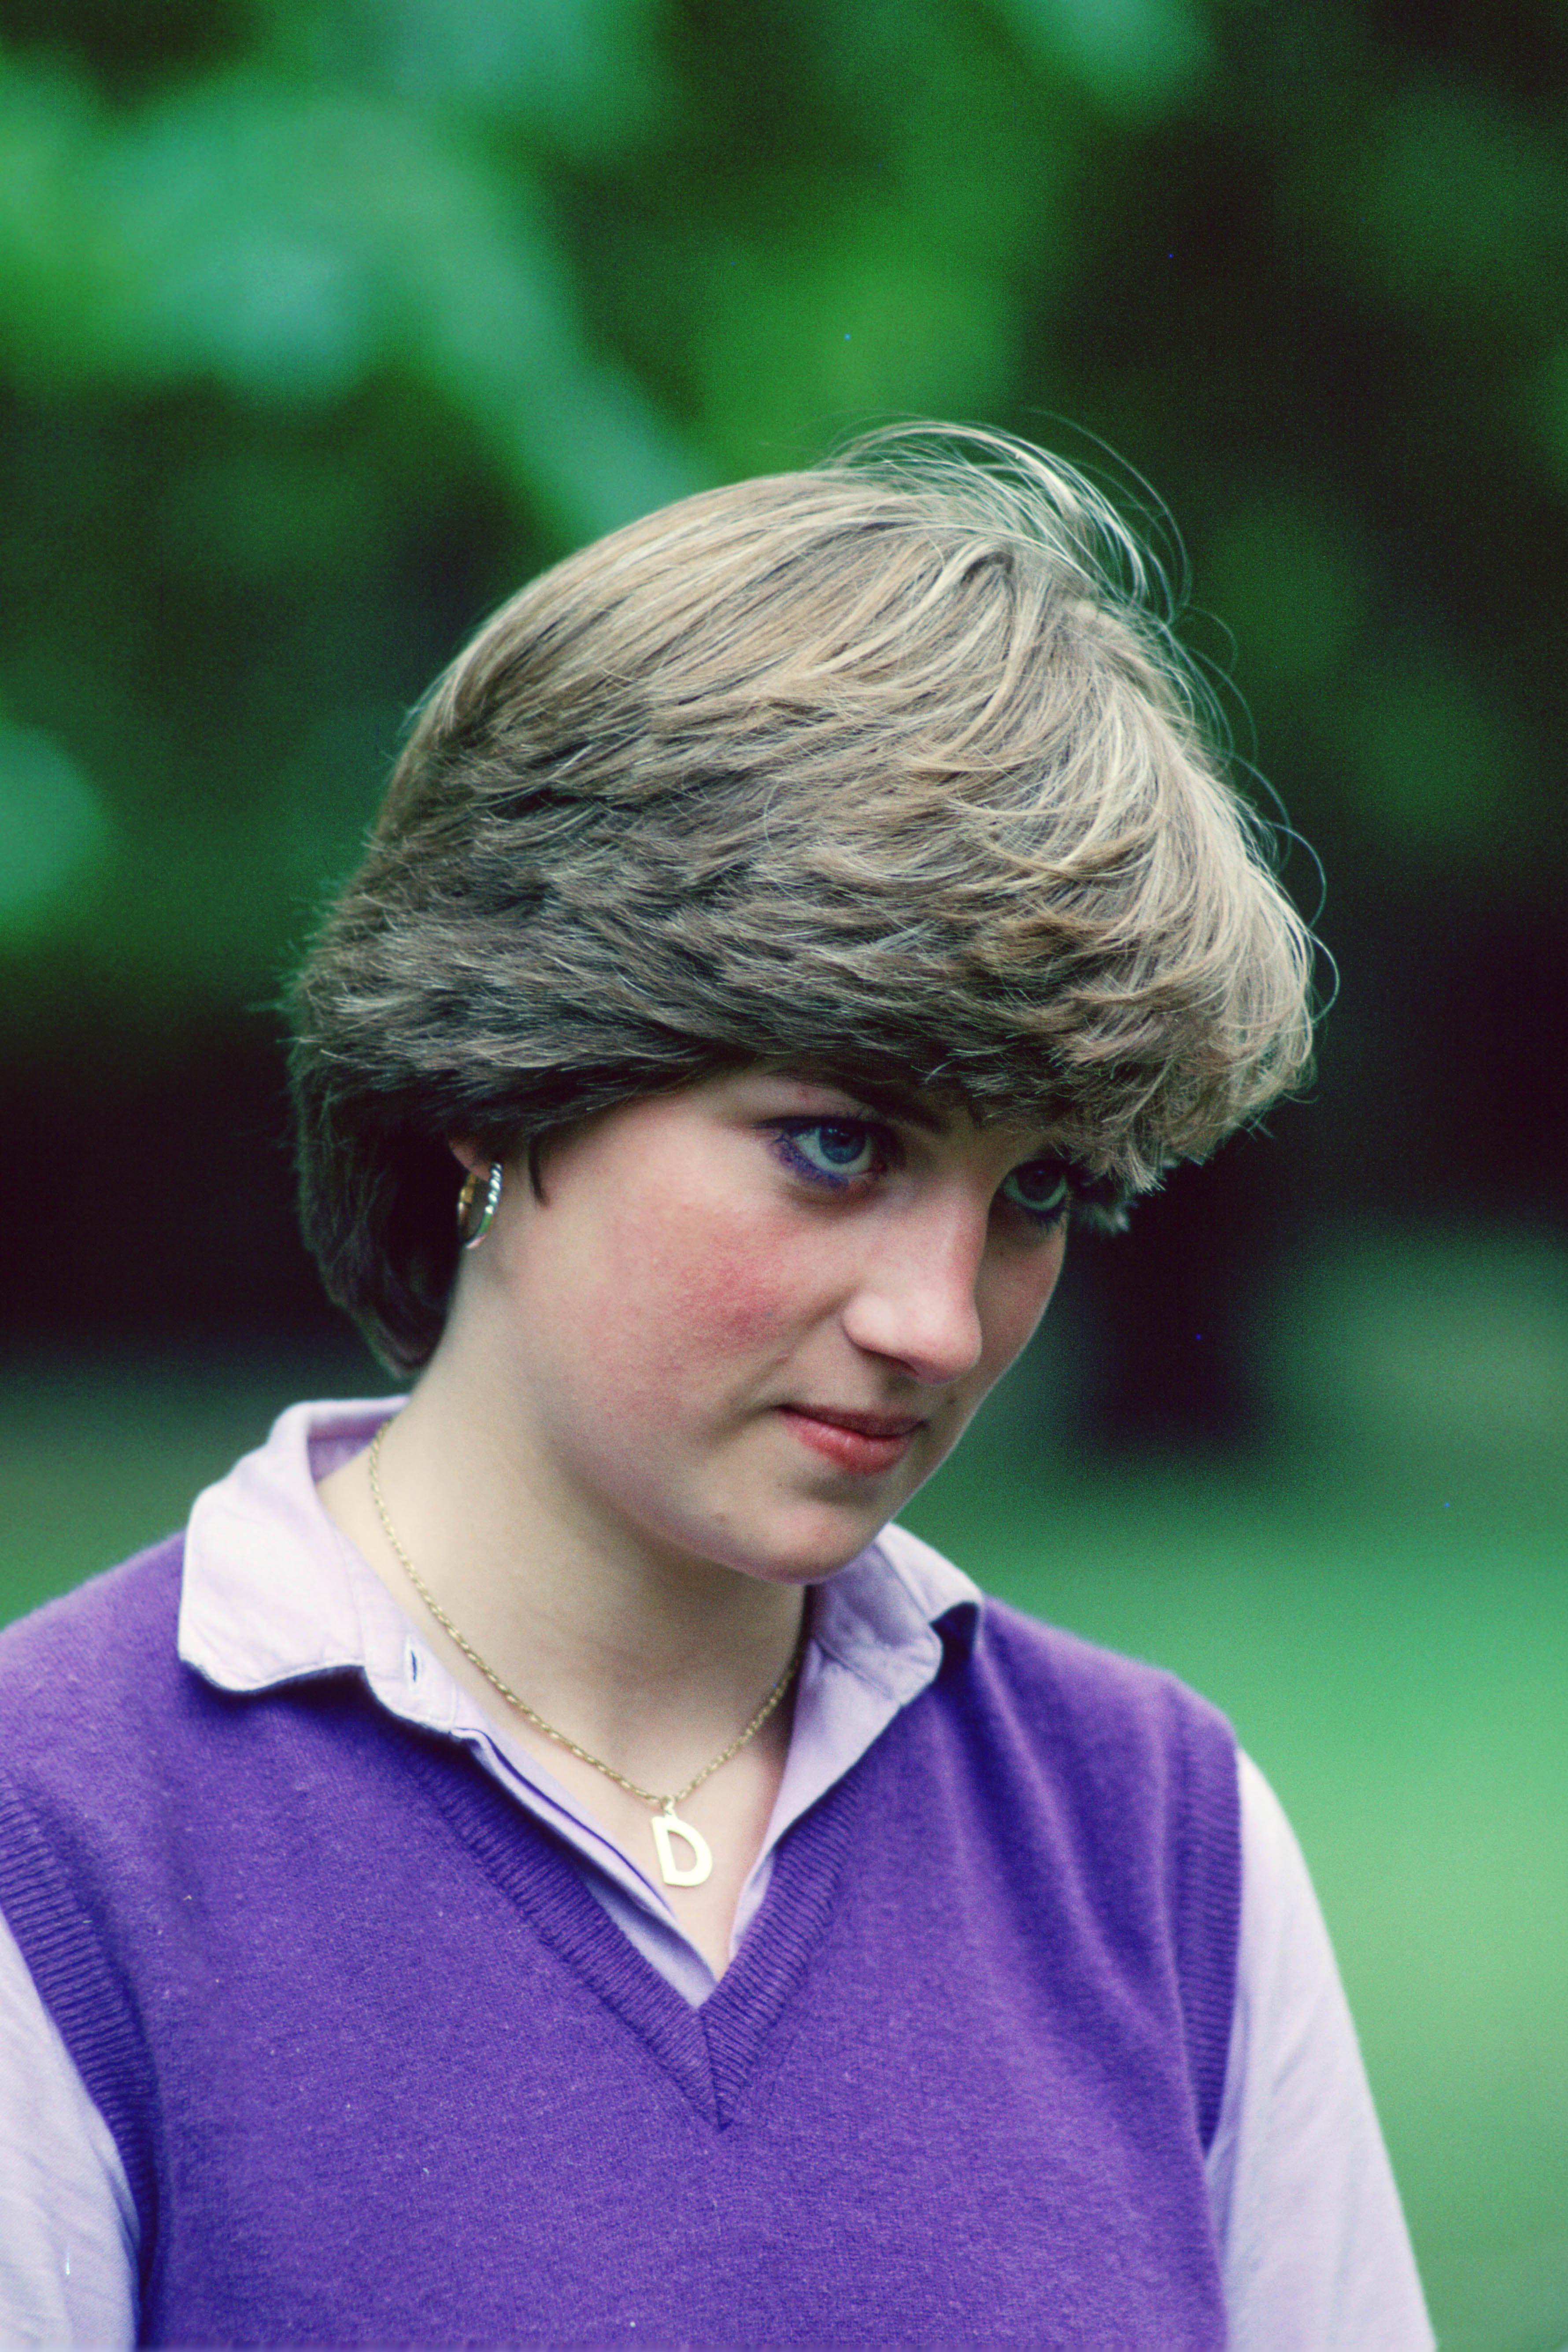 Diy Teenage Bedroom Ideas Princess Diana S Hair Though The Year Diana Princess Of